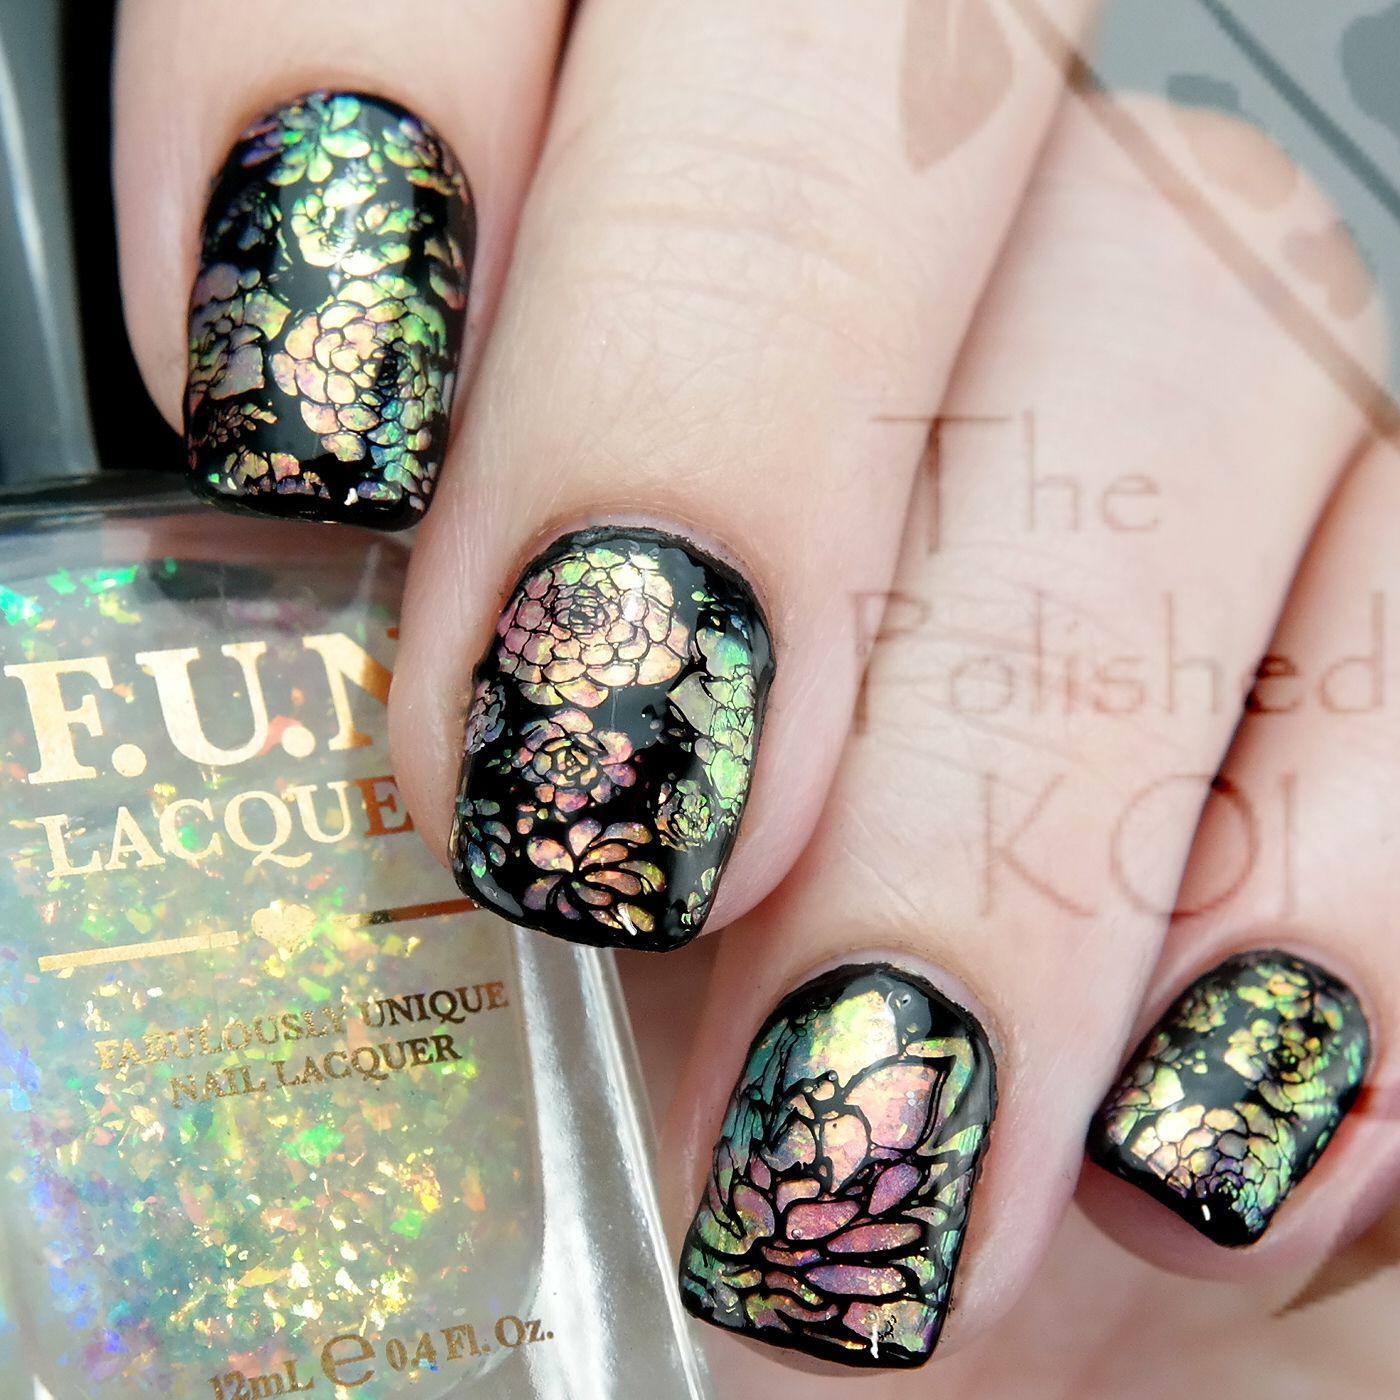 Rainbow Opal Nail Art - The Polished Koi | Nail design | Pinterest ...